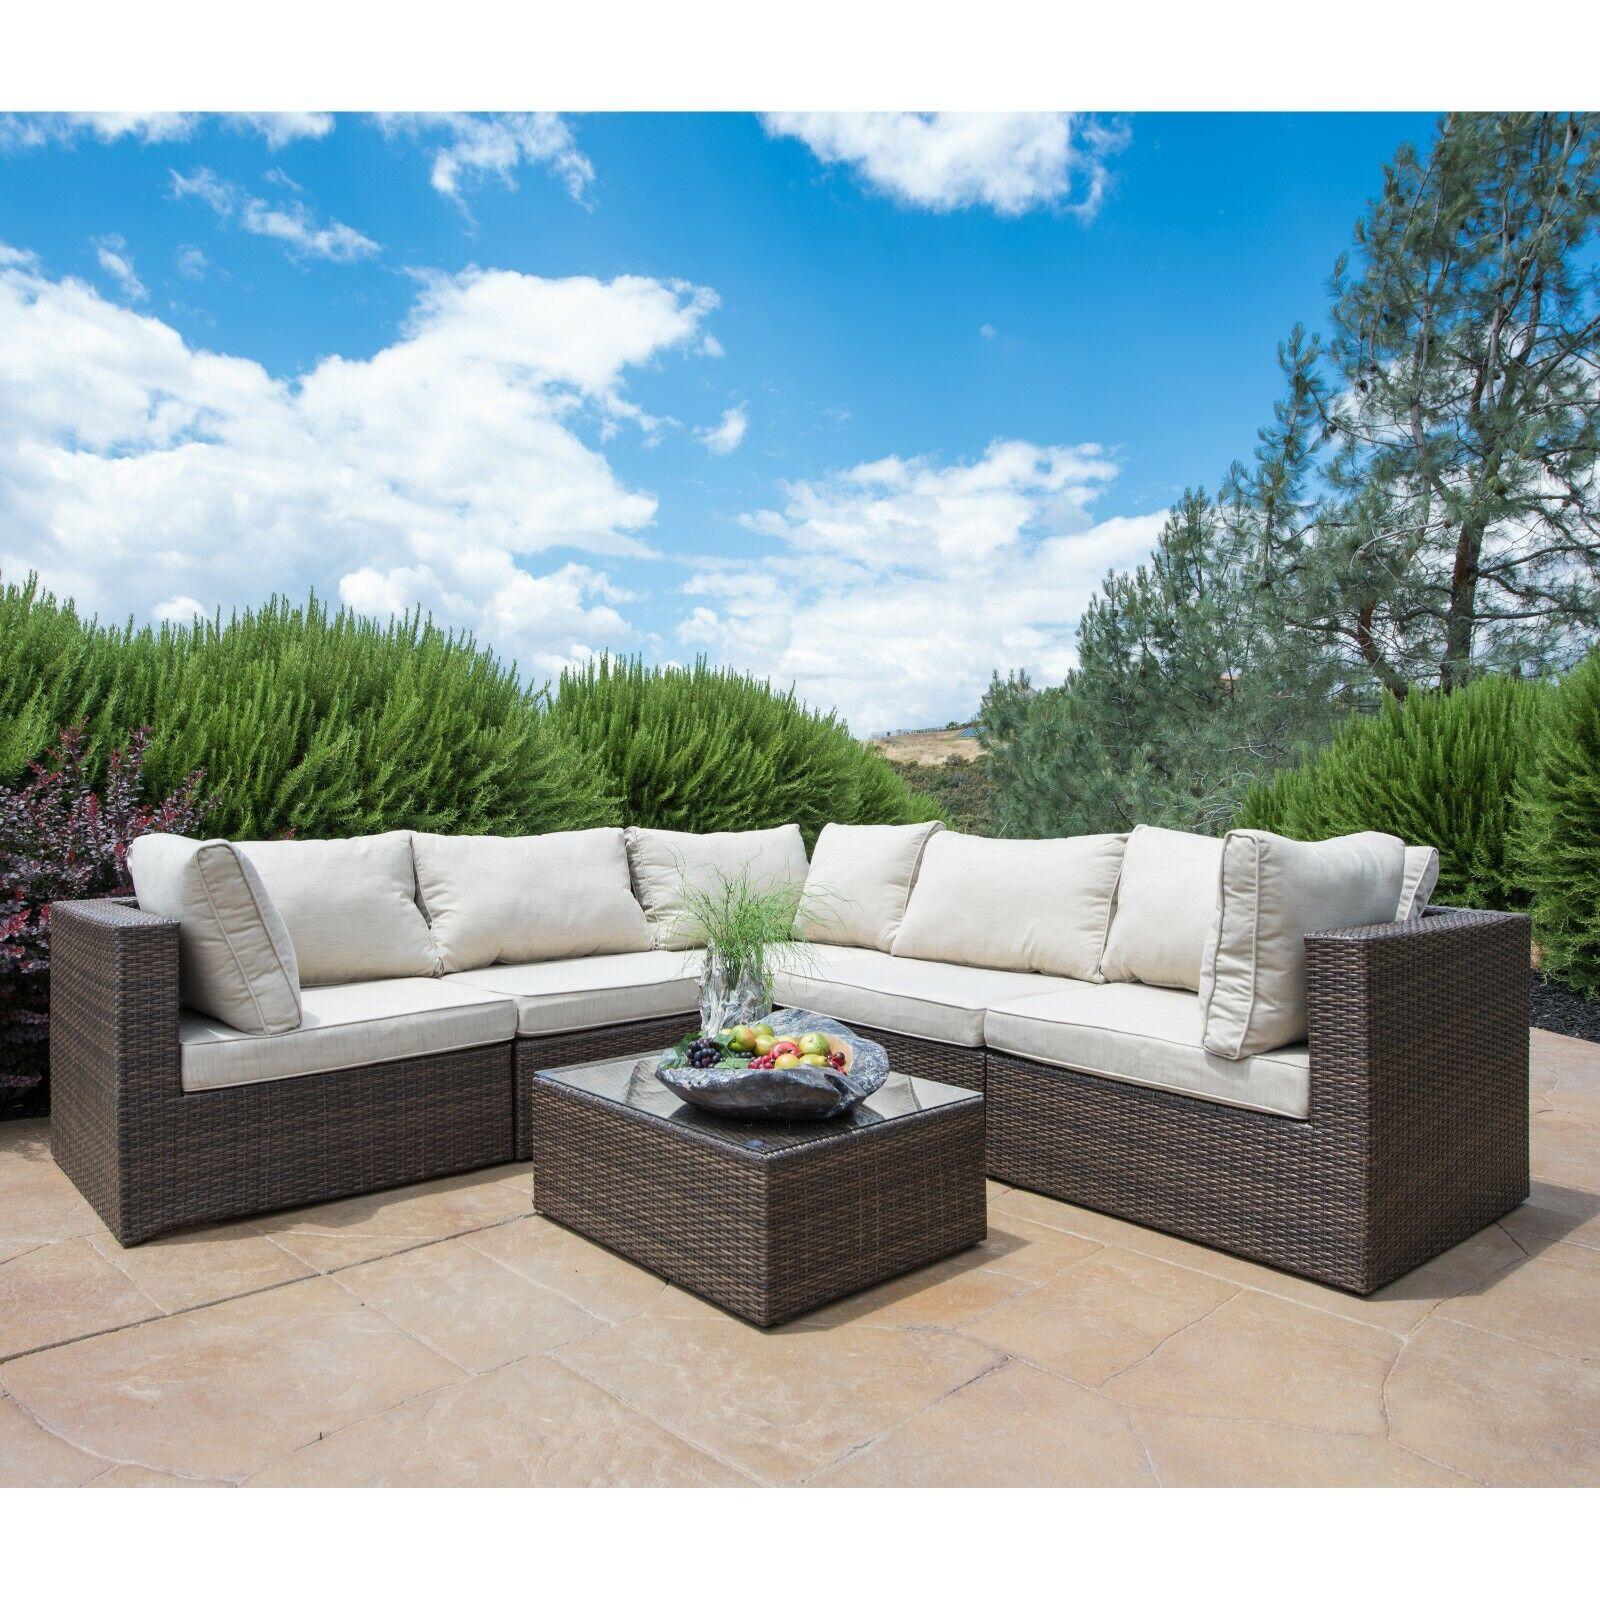 SUPERNOVA 6PC Patio Furniture Rattan Sofa Set Outdoor Wicker Sectional